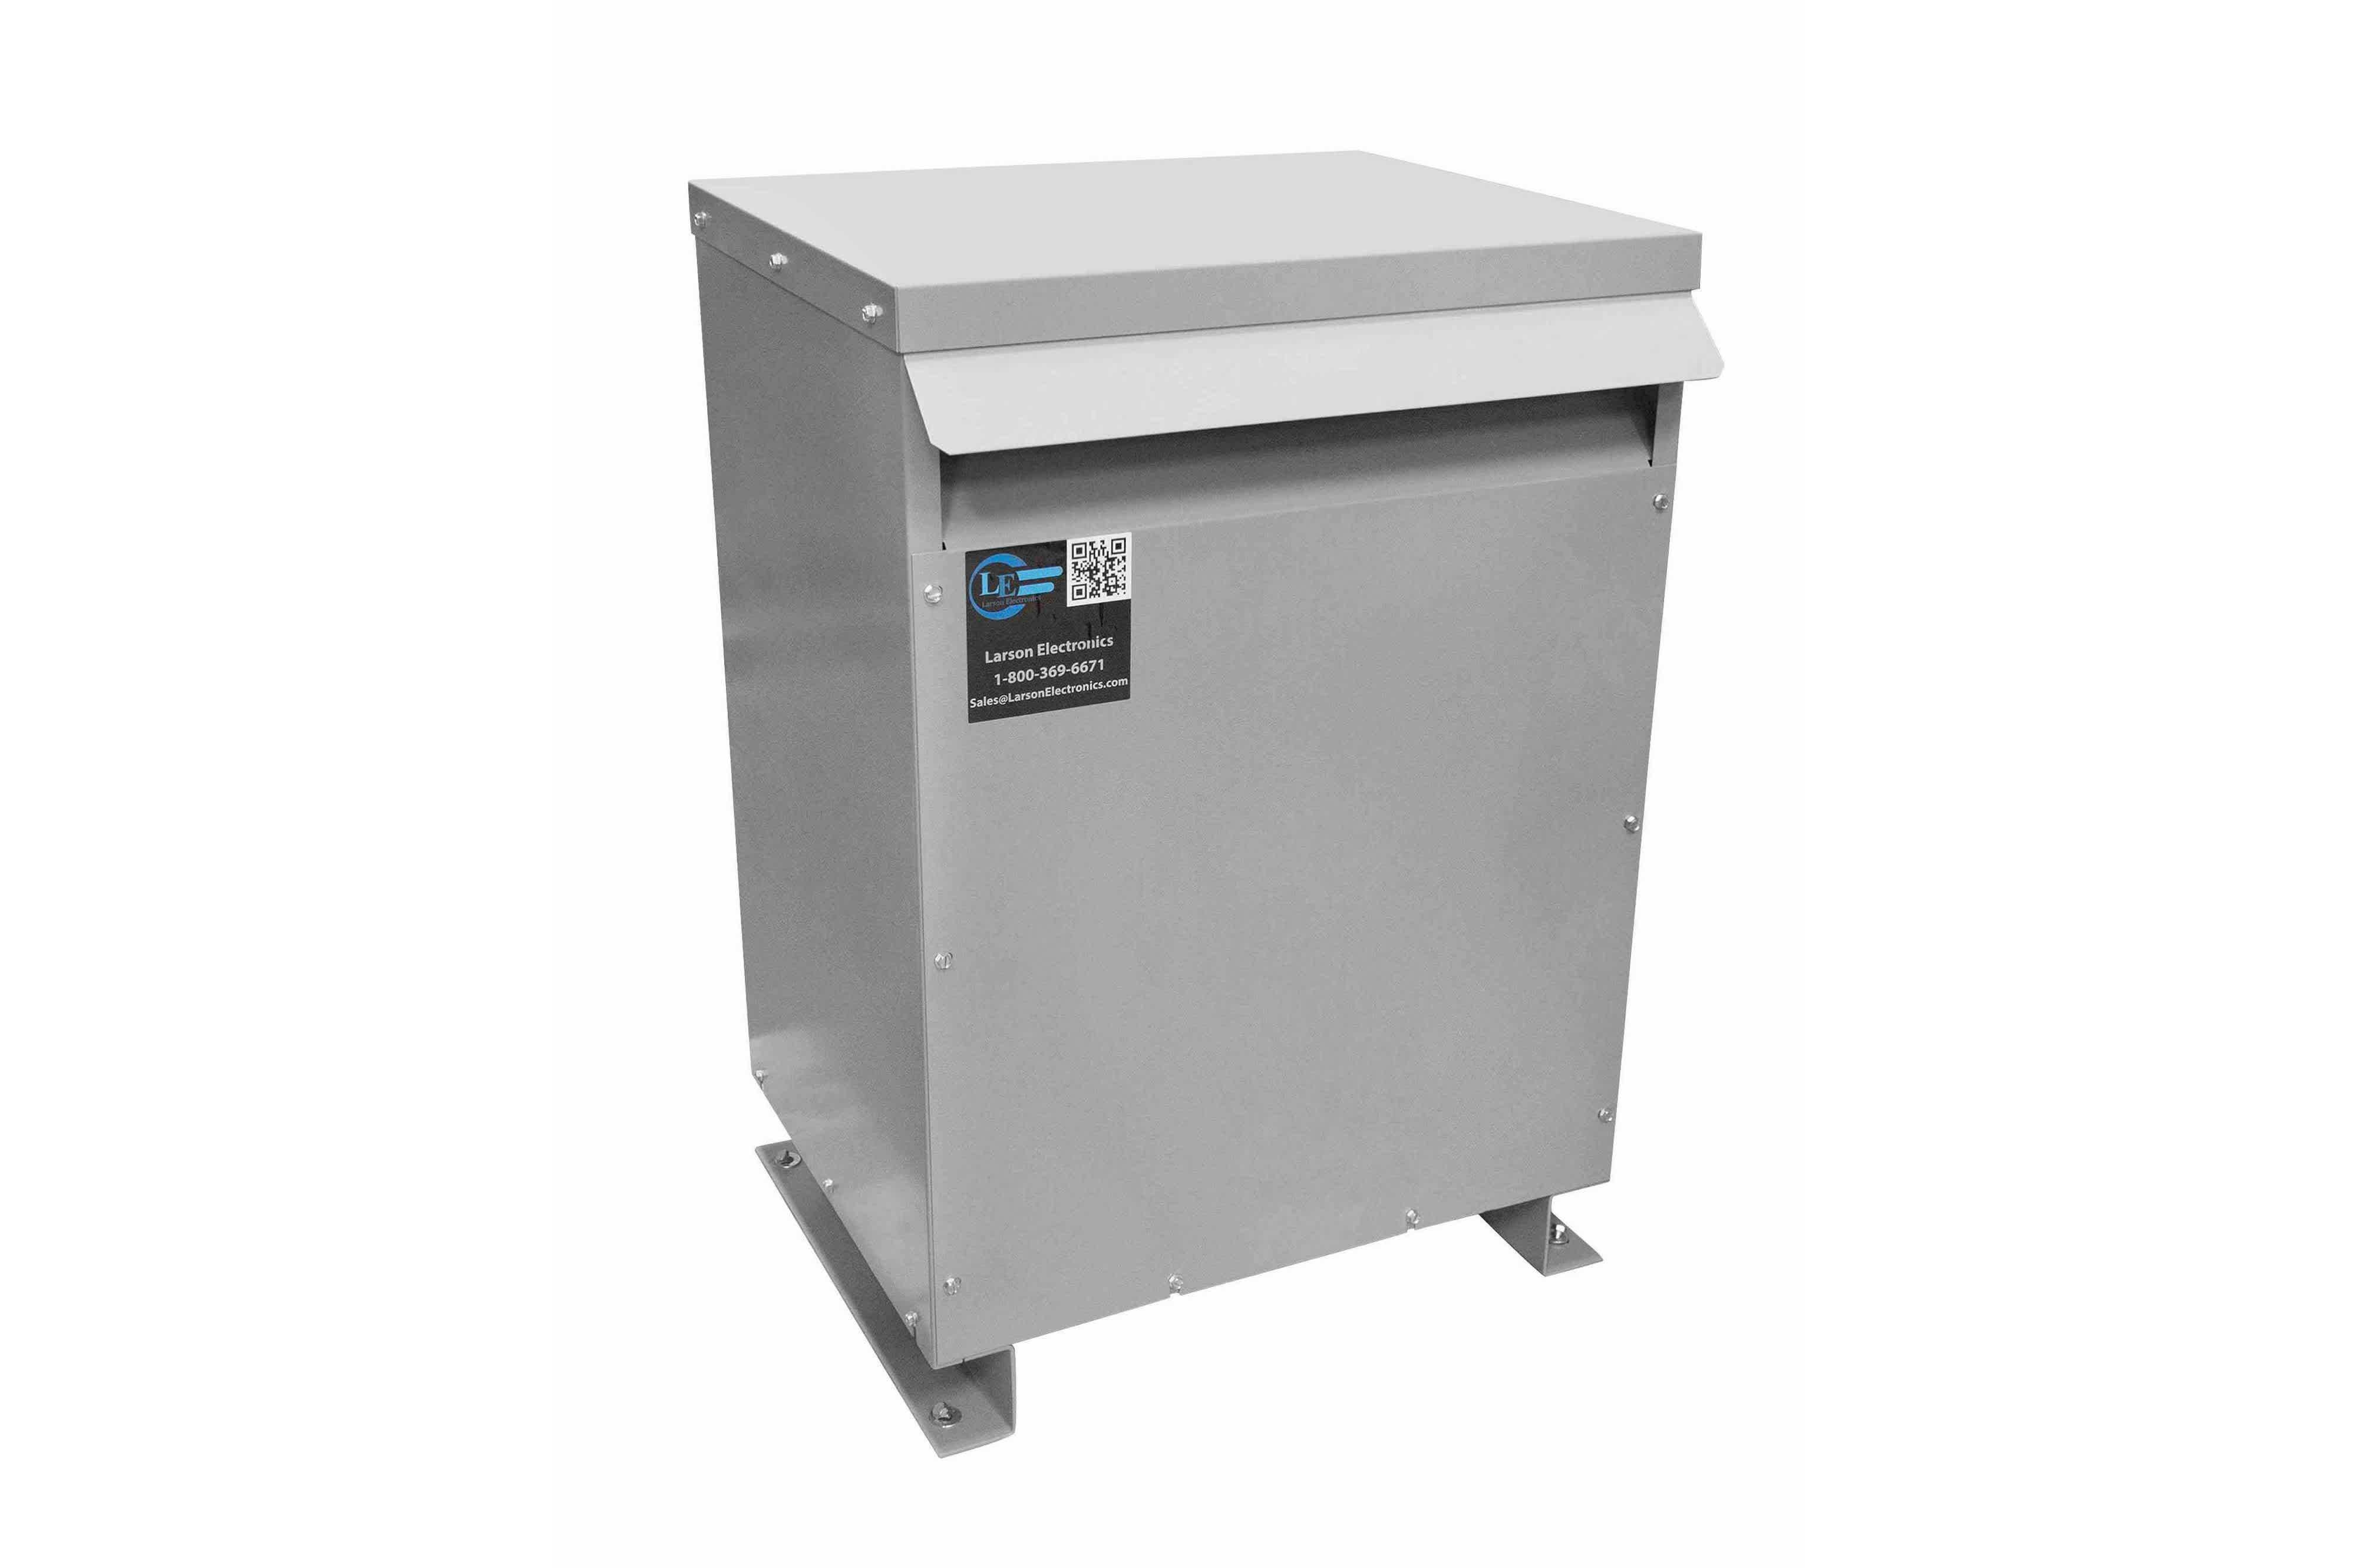 175 kVA 3PH Isolation Transformer, 400V Wye Primary, 208Y/120 Wye-N Secondary, N3R, Ventilated, 60 Hz